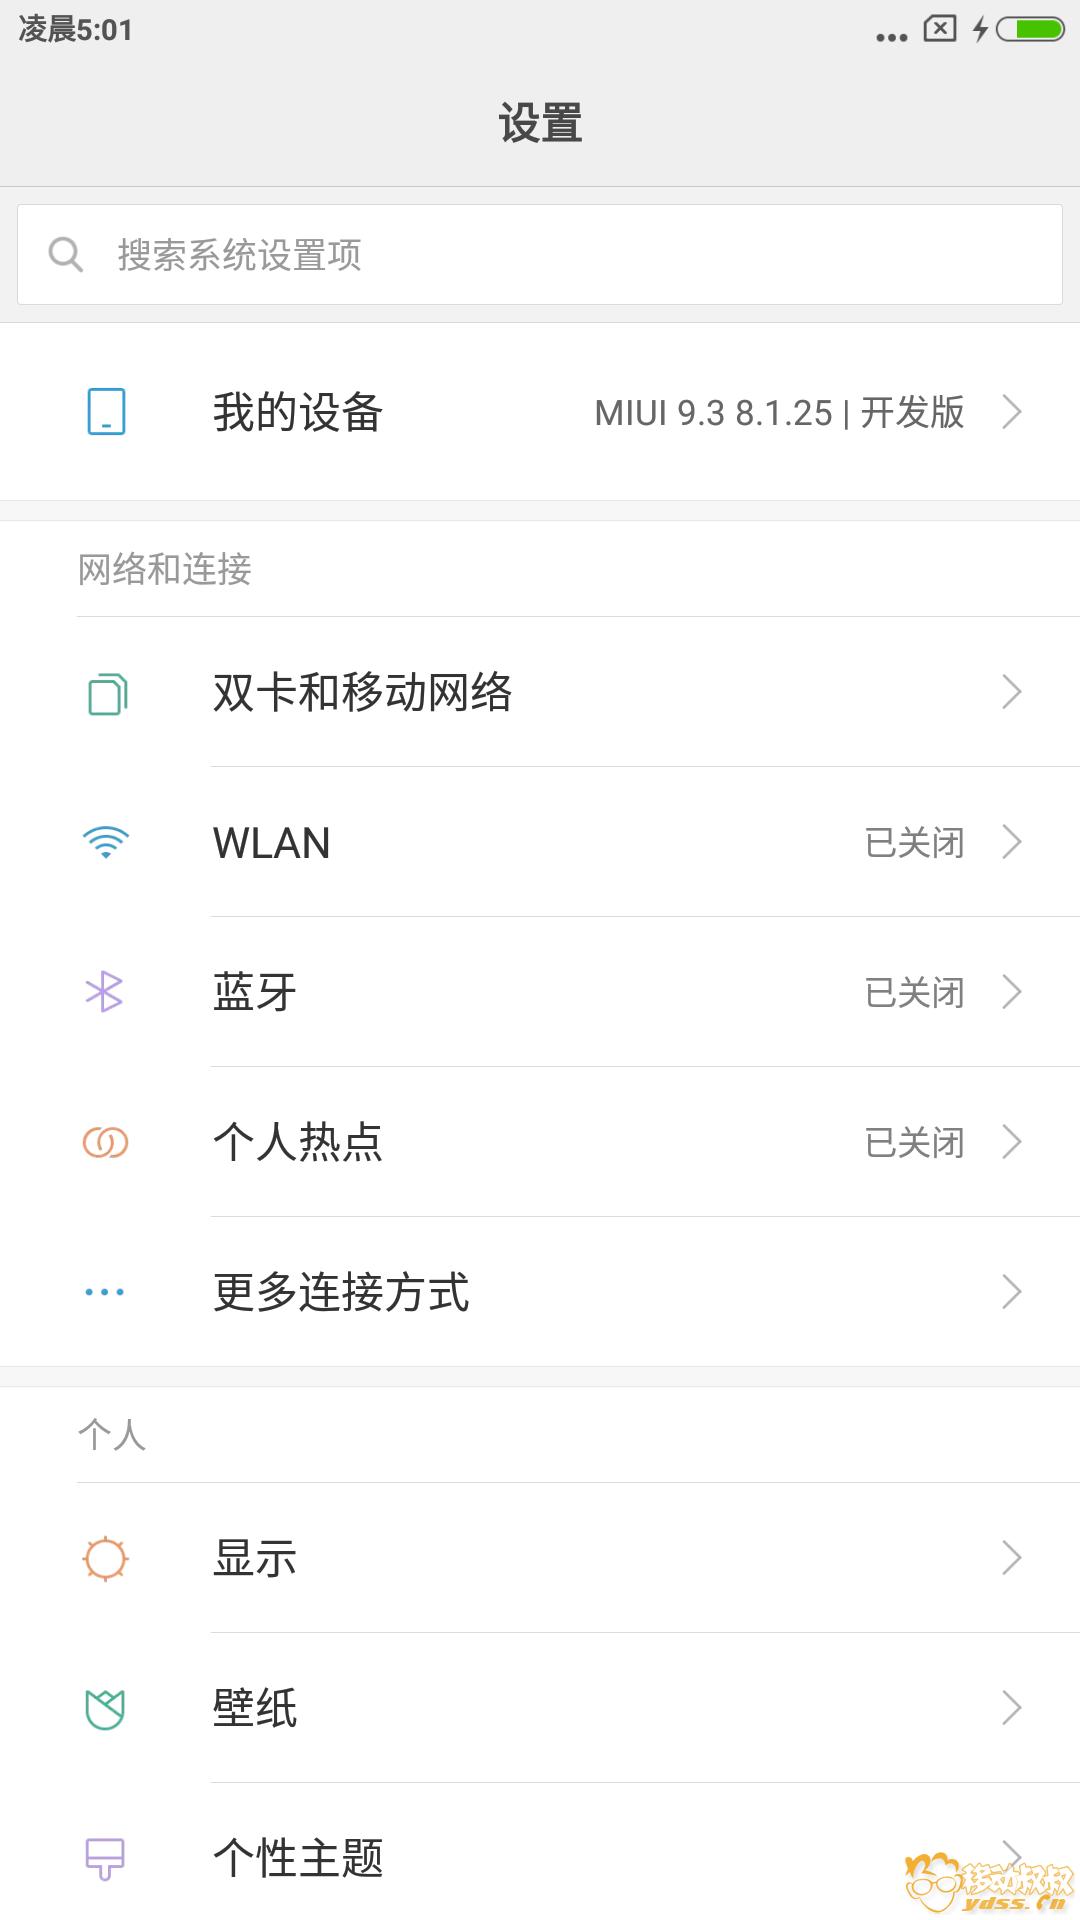 Screenshot_2018-01-30-05-01-14-851_com.android.settings.png